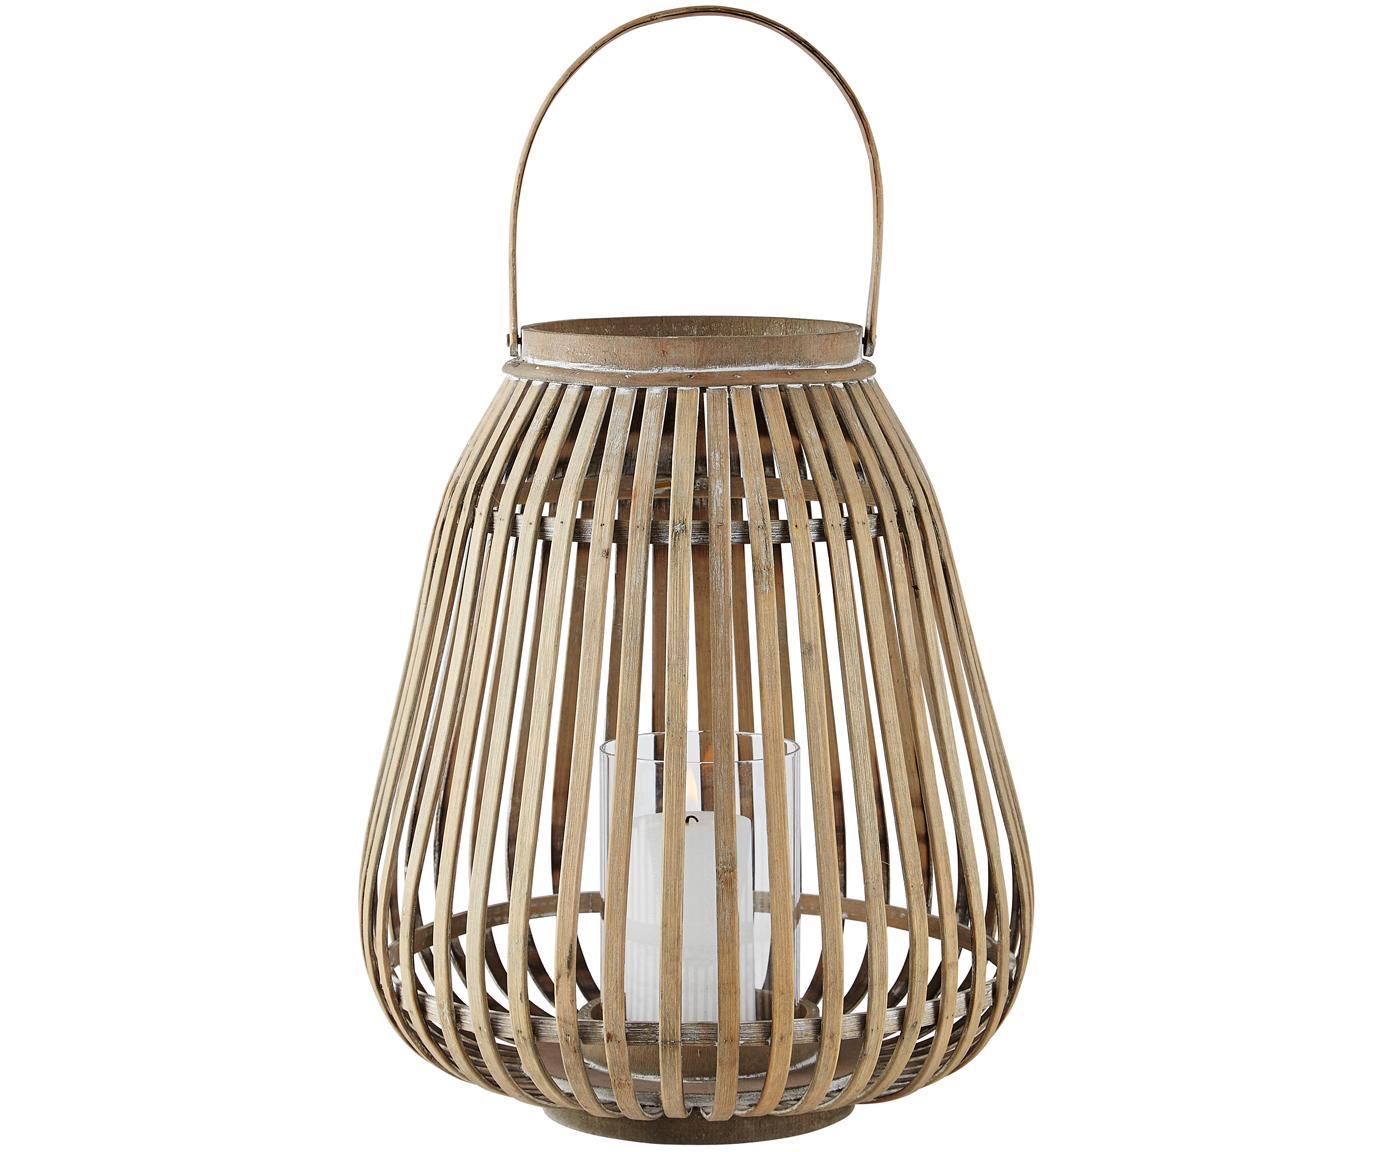 Laterne Alma, Gestell: Bambus, Windlicht: Glas, Gestell: Bambus<br>Windlicht: Transparent, Ø 29 x H 35 cm